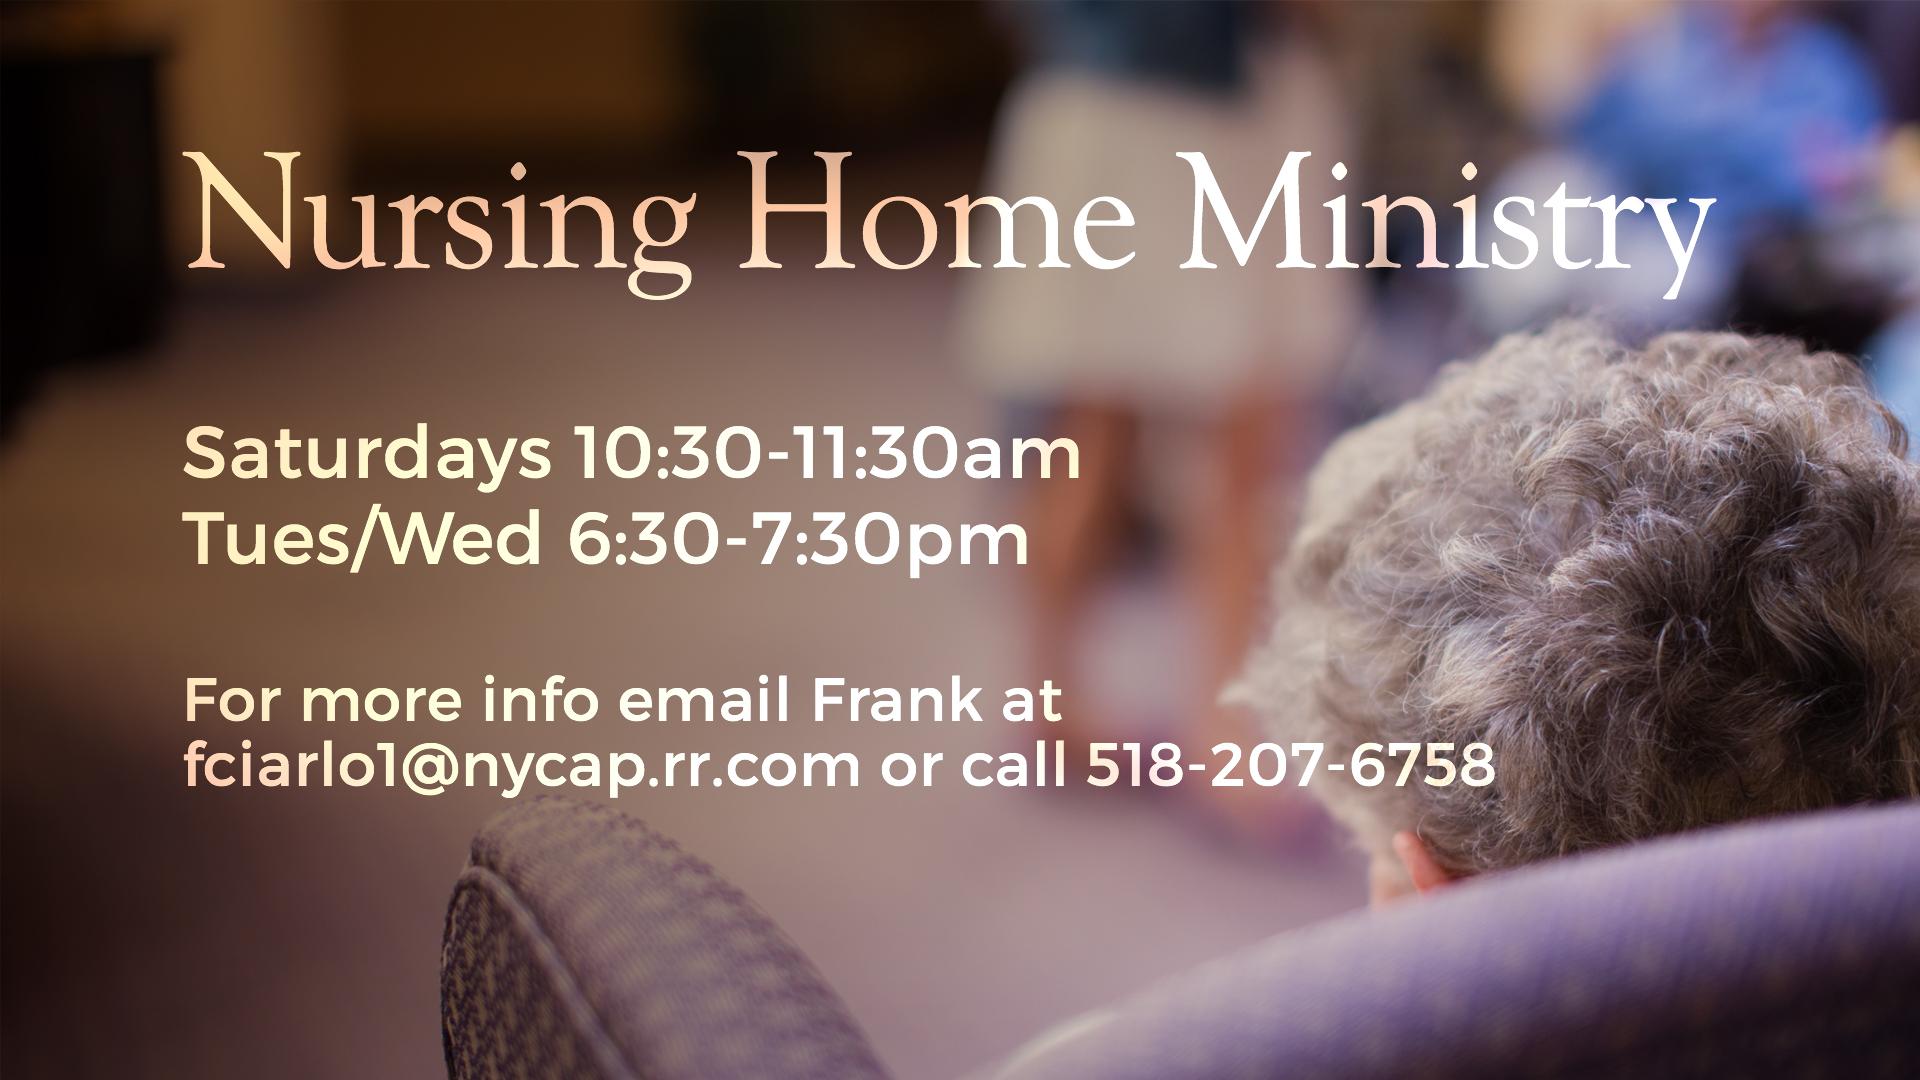 Nursing Home Ministry Opportunity